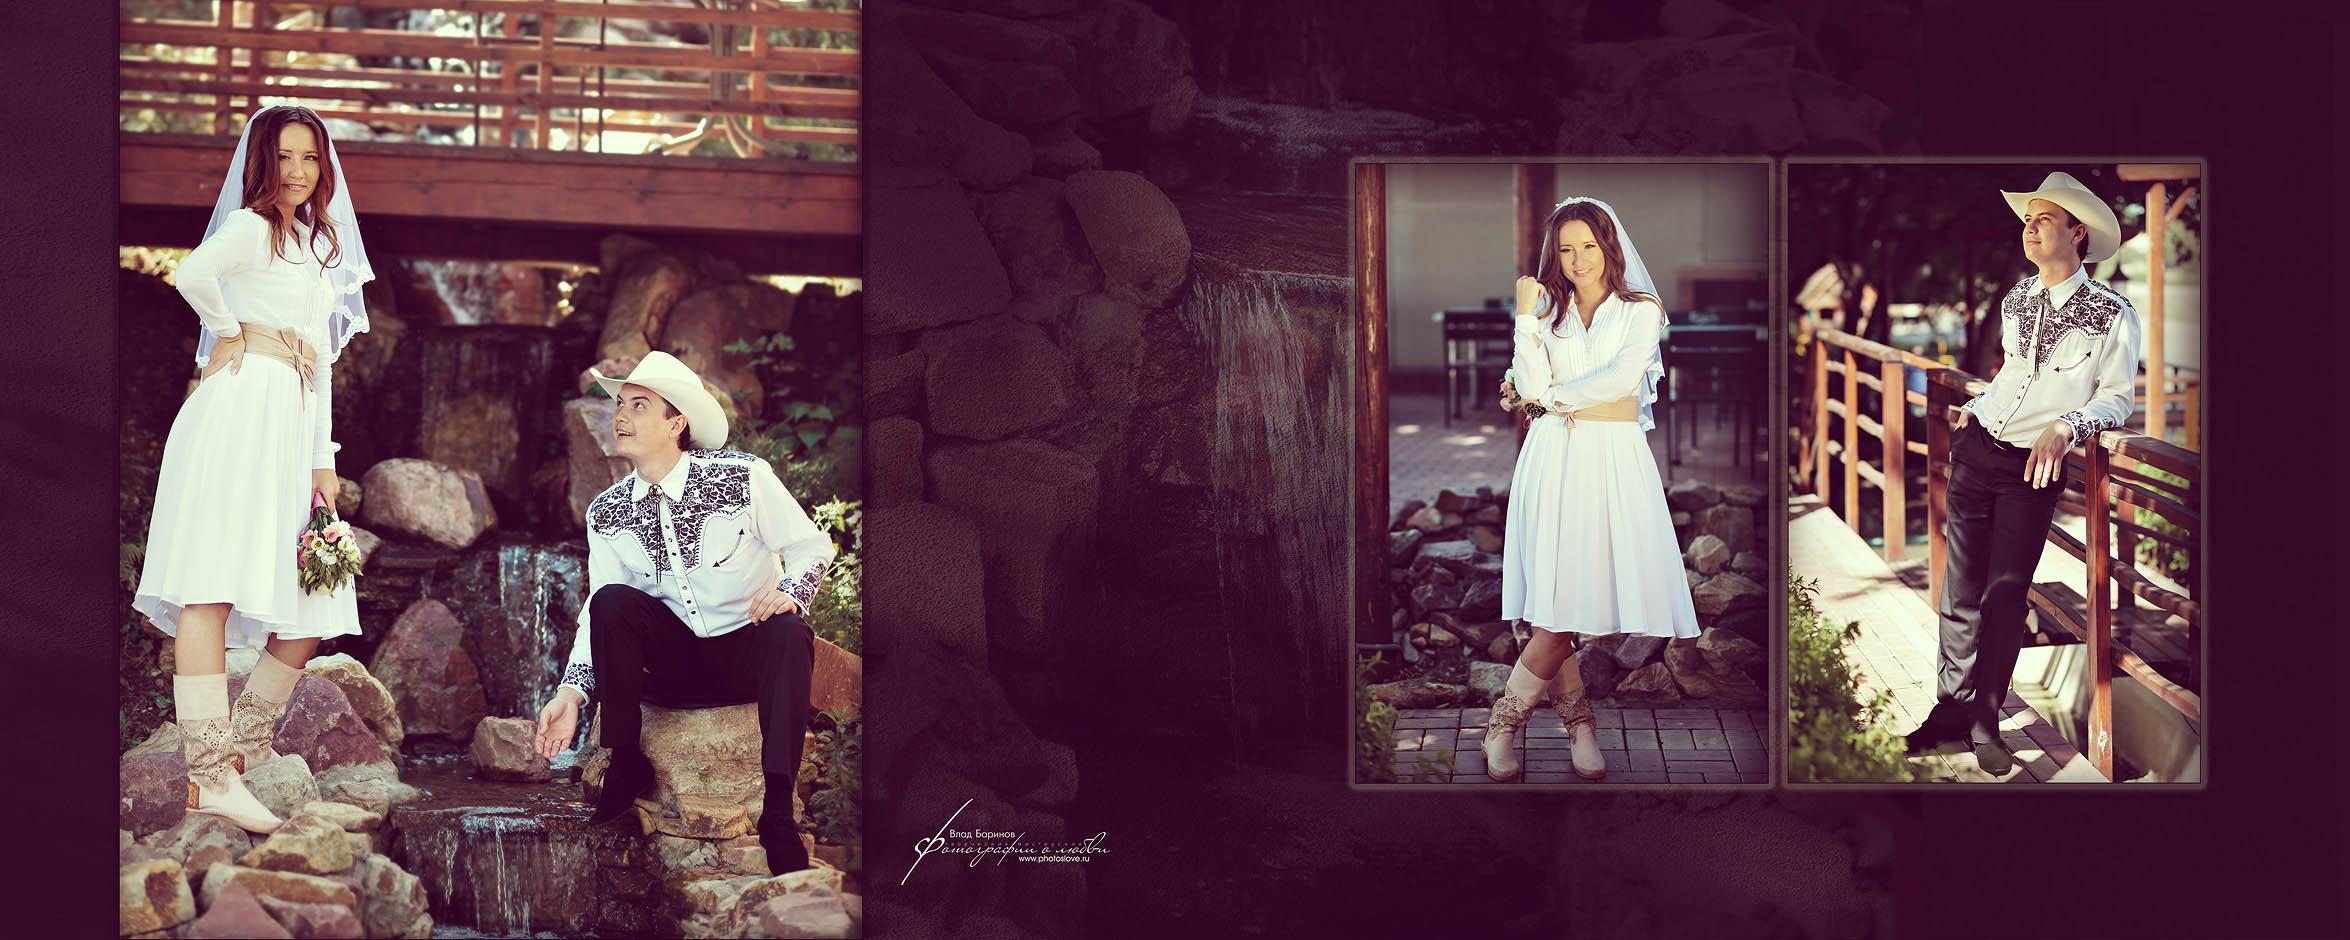 Кантри свадьба. Фотокнига.